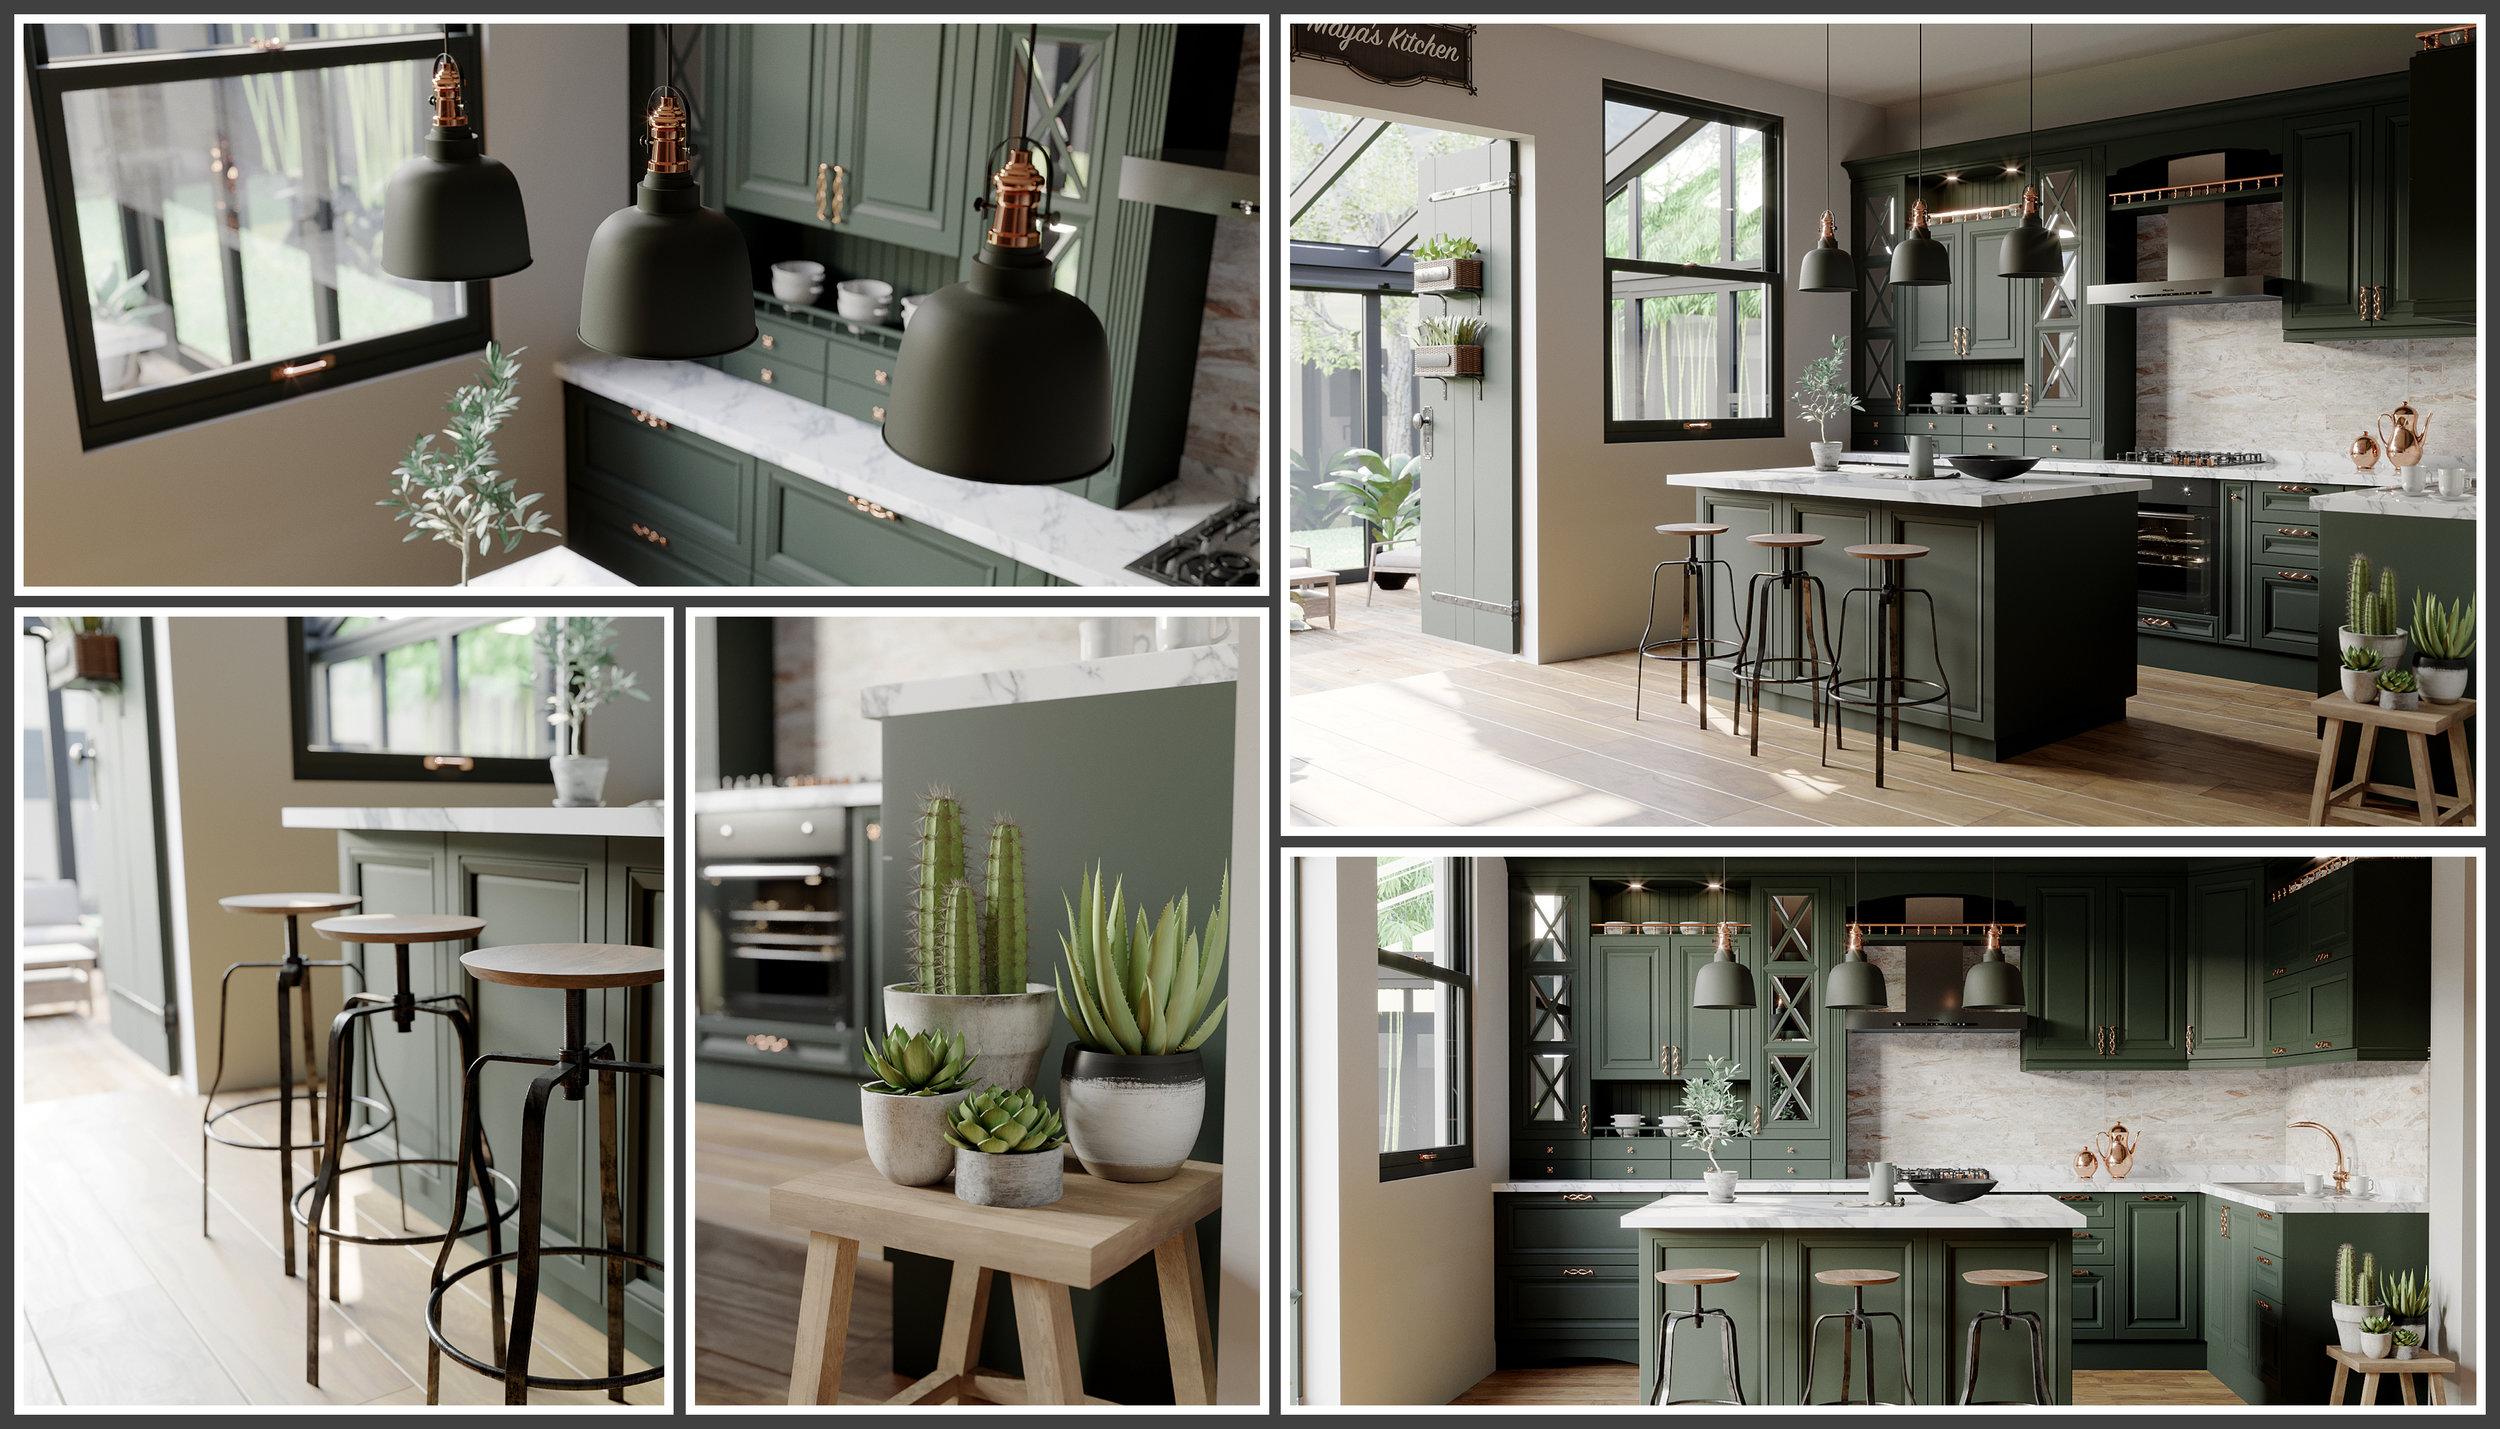 Maya's Green Kitchen